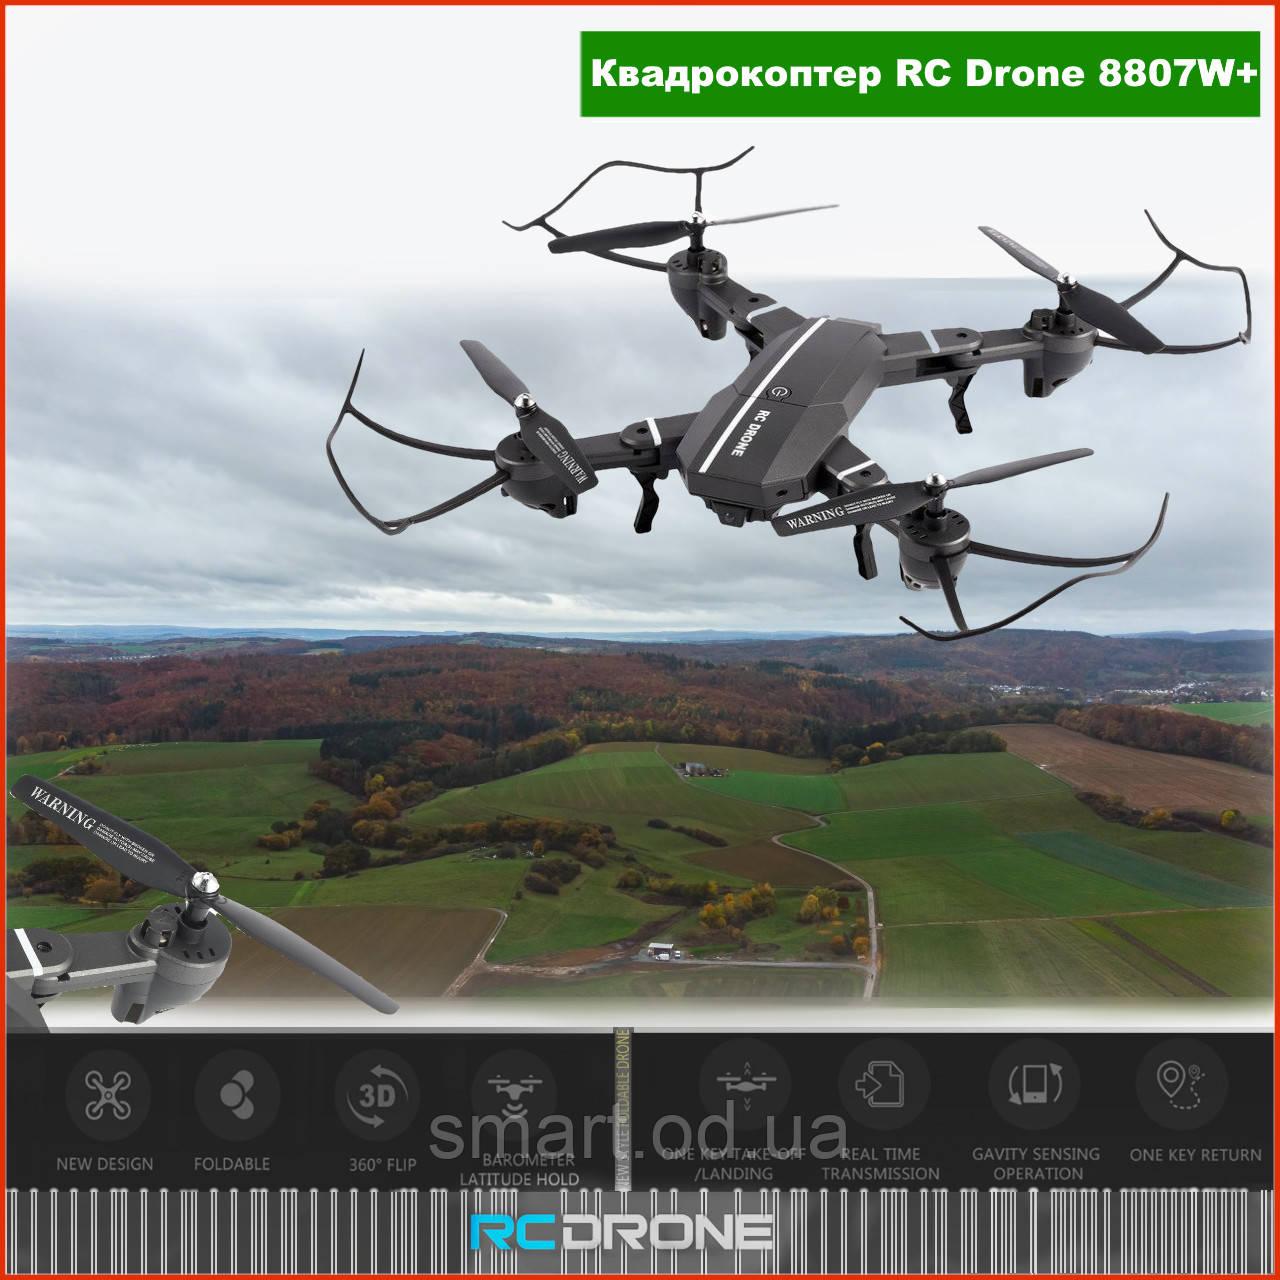 Квадрокоптер дрон RC Drone 8807W+ с дистанционным управлением и WiFi HD камерой 720P авто безголовый режим